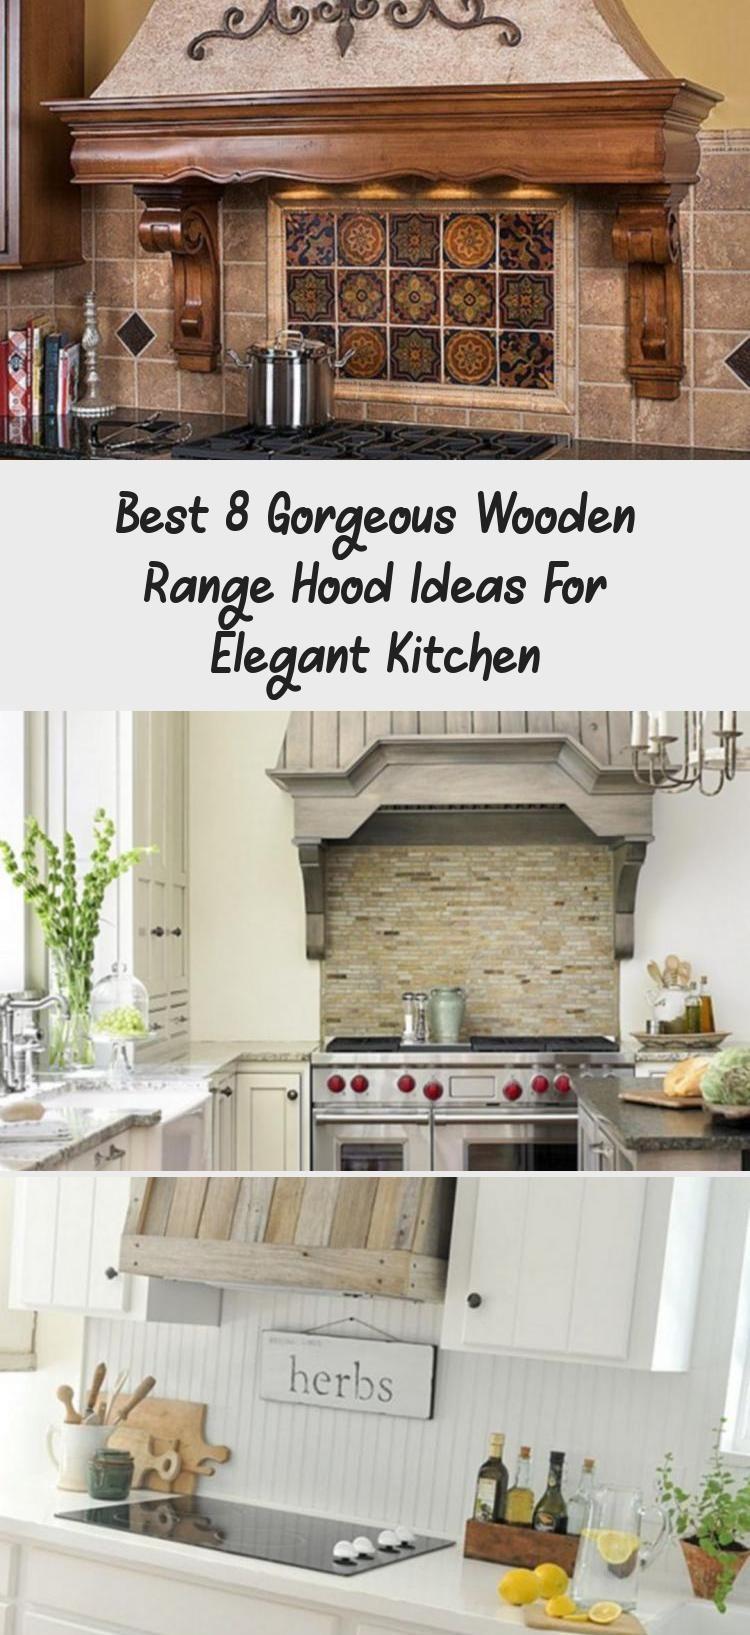 Best 8 Gorgeous Wooden Range Hood Ideas For Elegant Kitchen Pinokyo In 2020 Elegant Kitchens Wooden Range Hood White Wood Kitchens